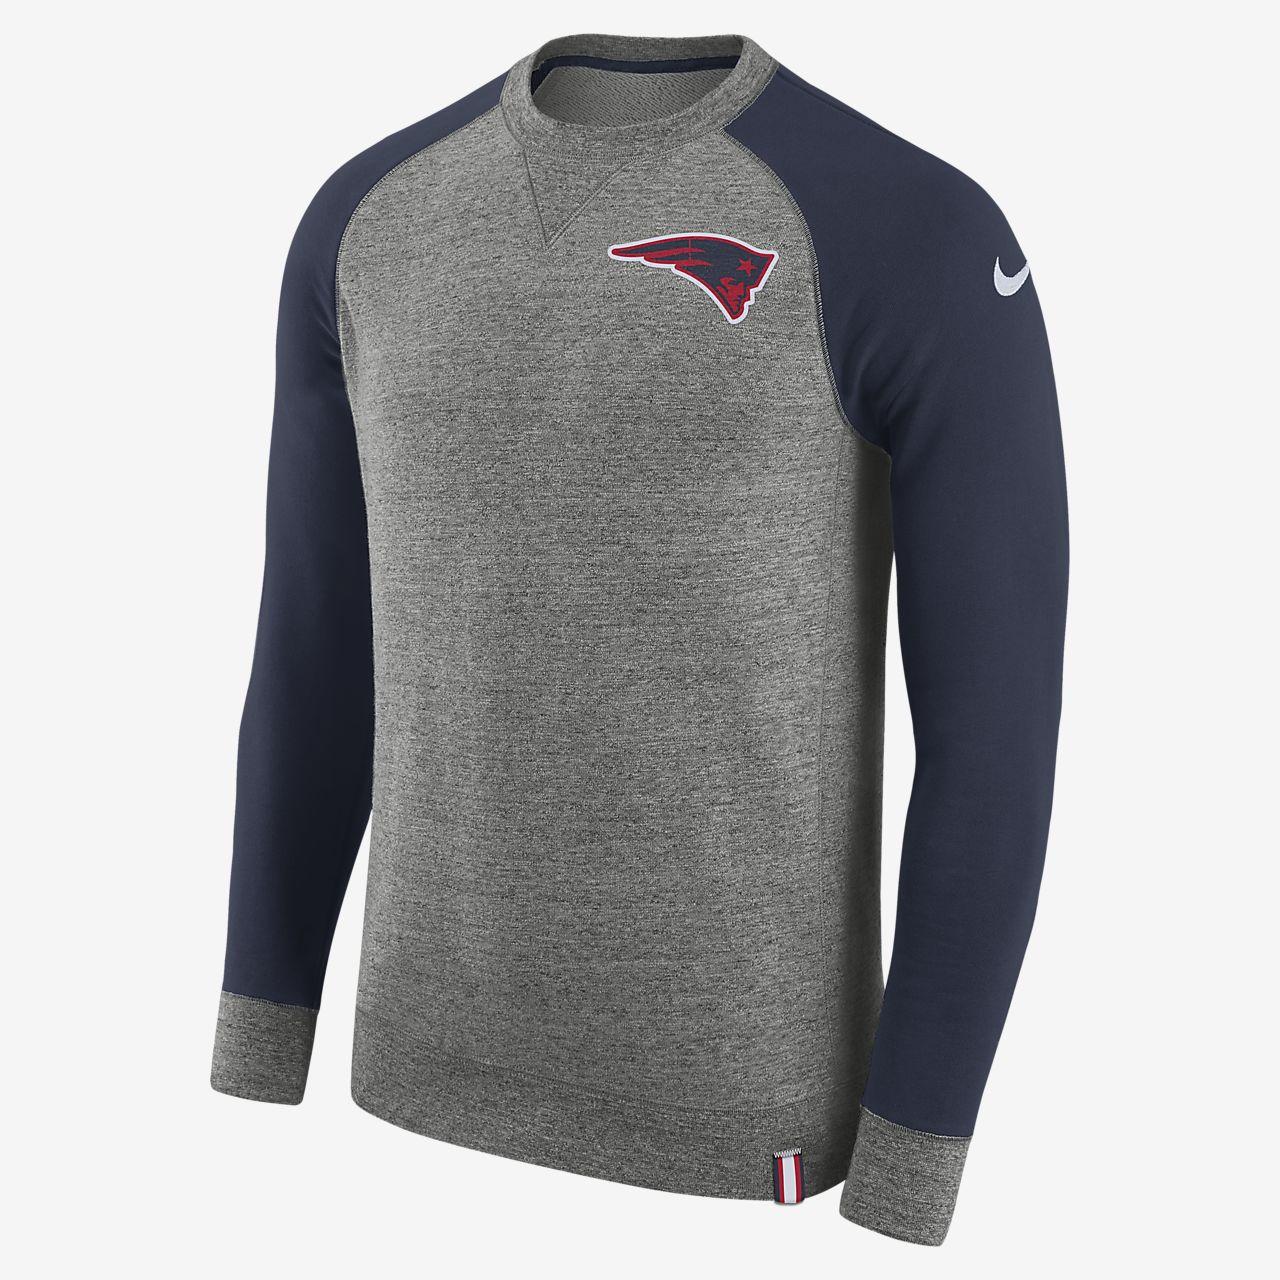 Aw77nfl Shirt Homme Sweat PatriotsPour Nike MSpzUV